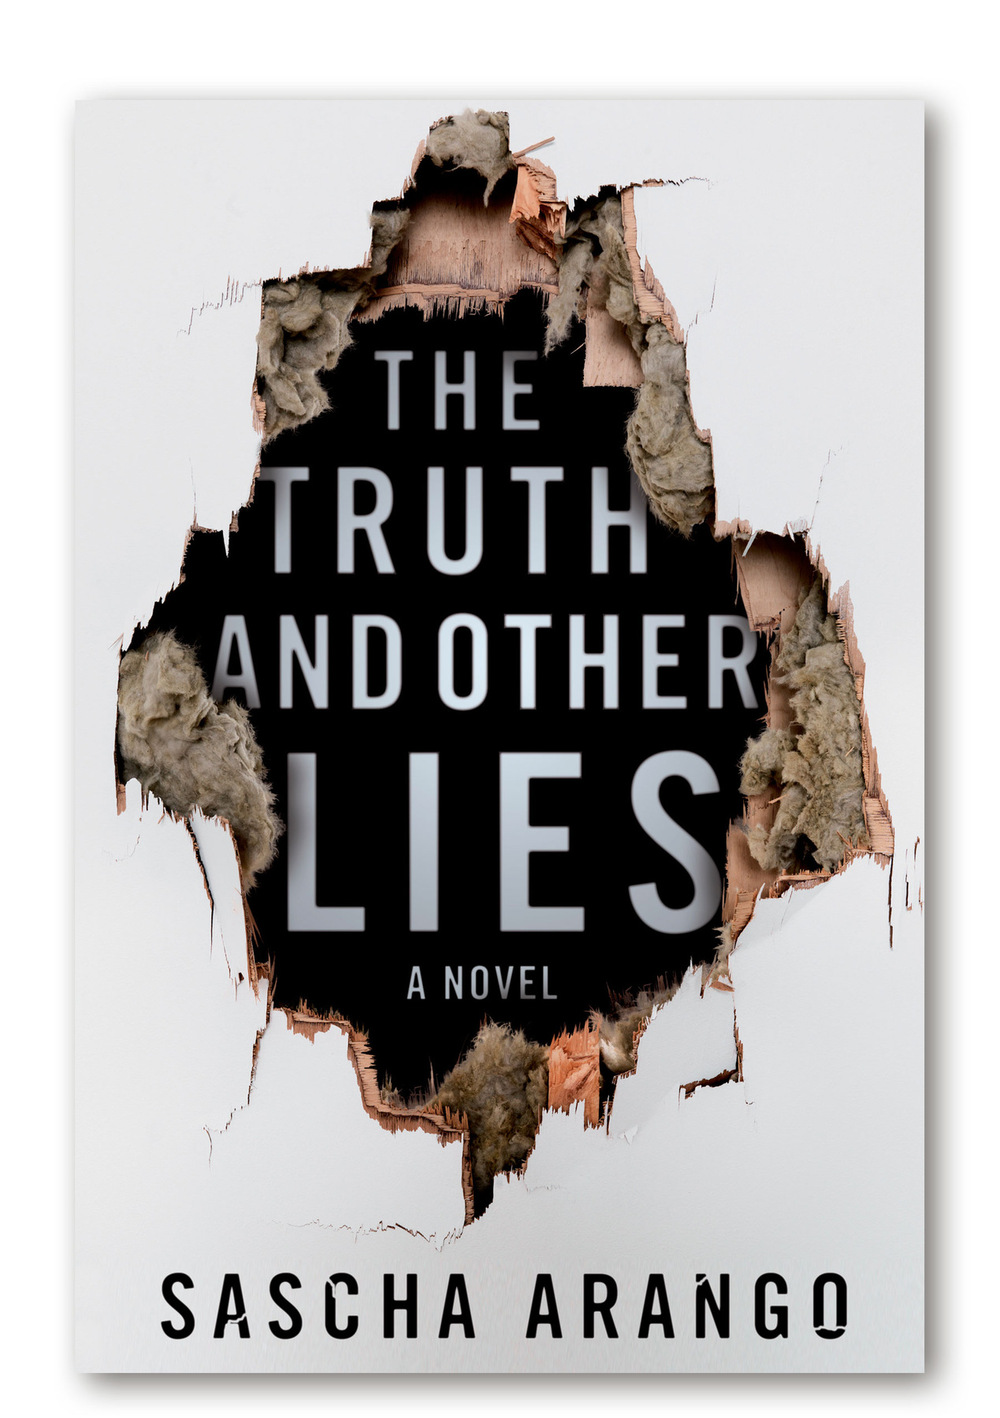 Chelsea McGuckin Design - Atria Books, June 2015